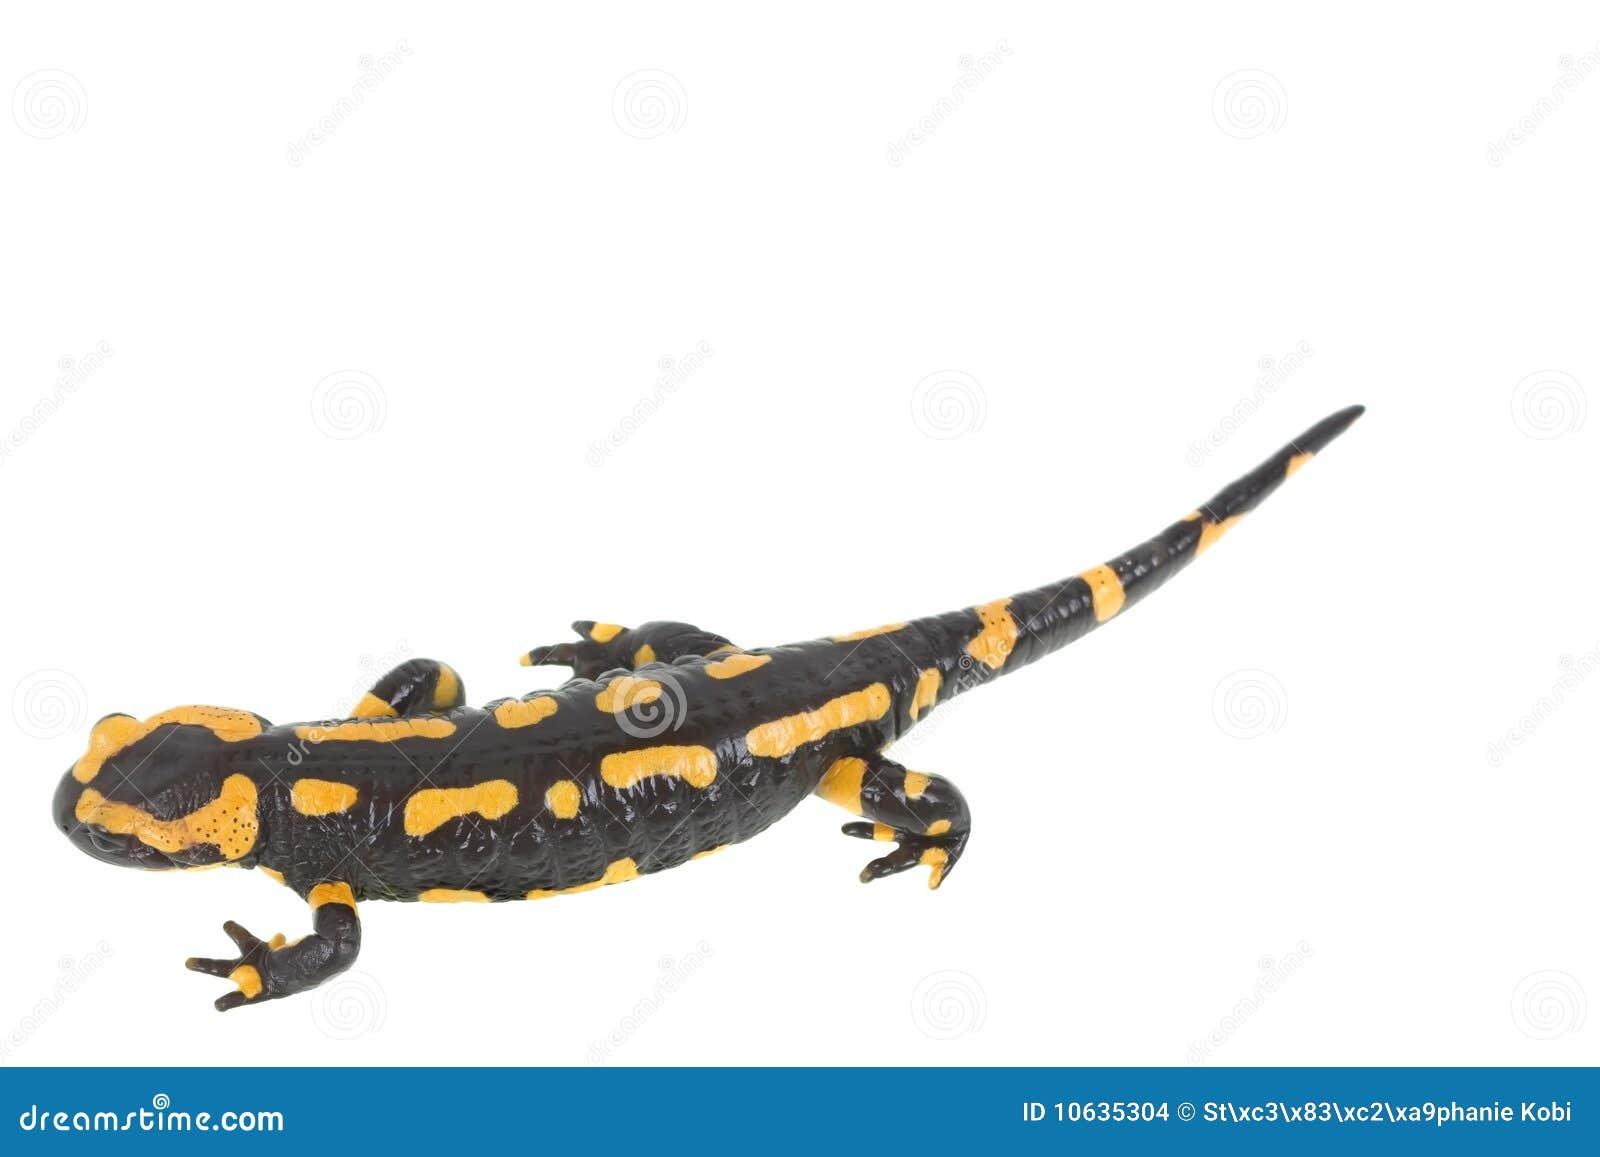 salamander white background - photo #2